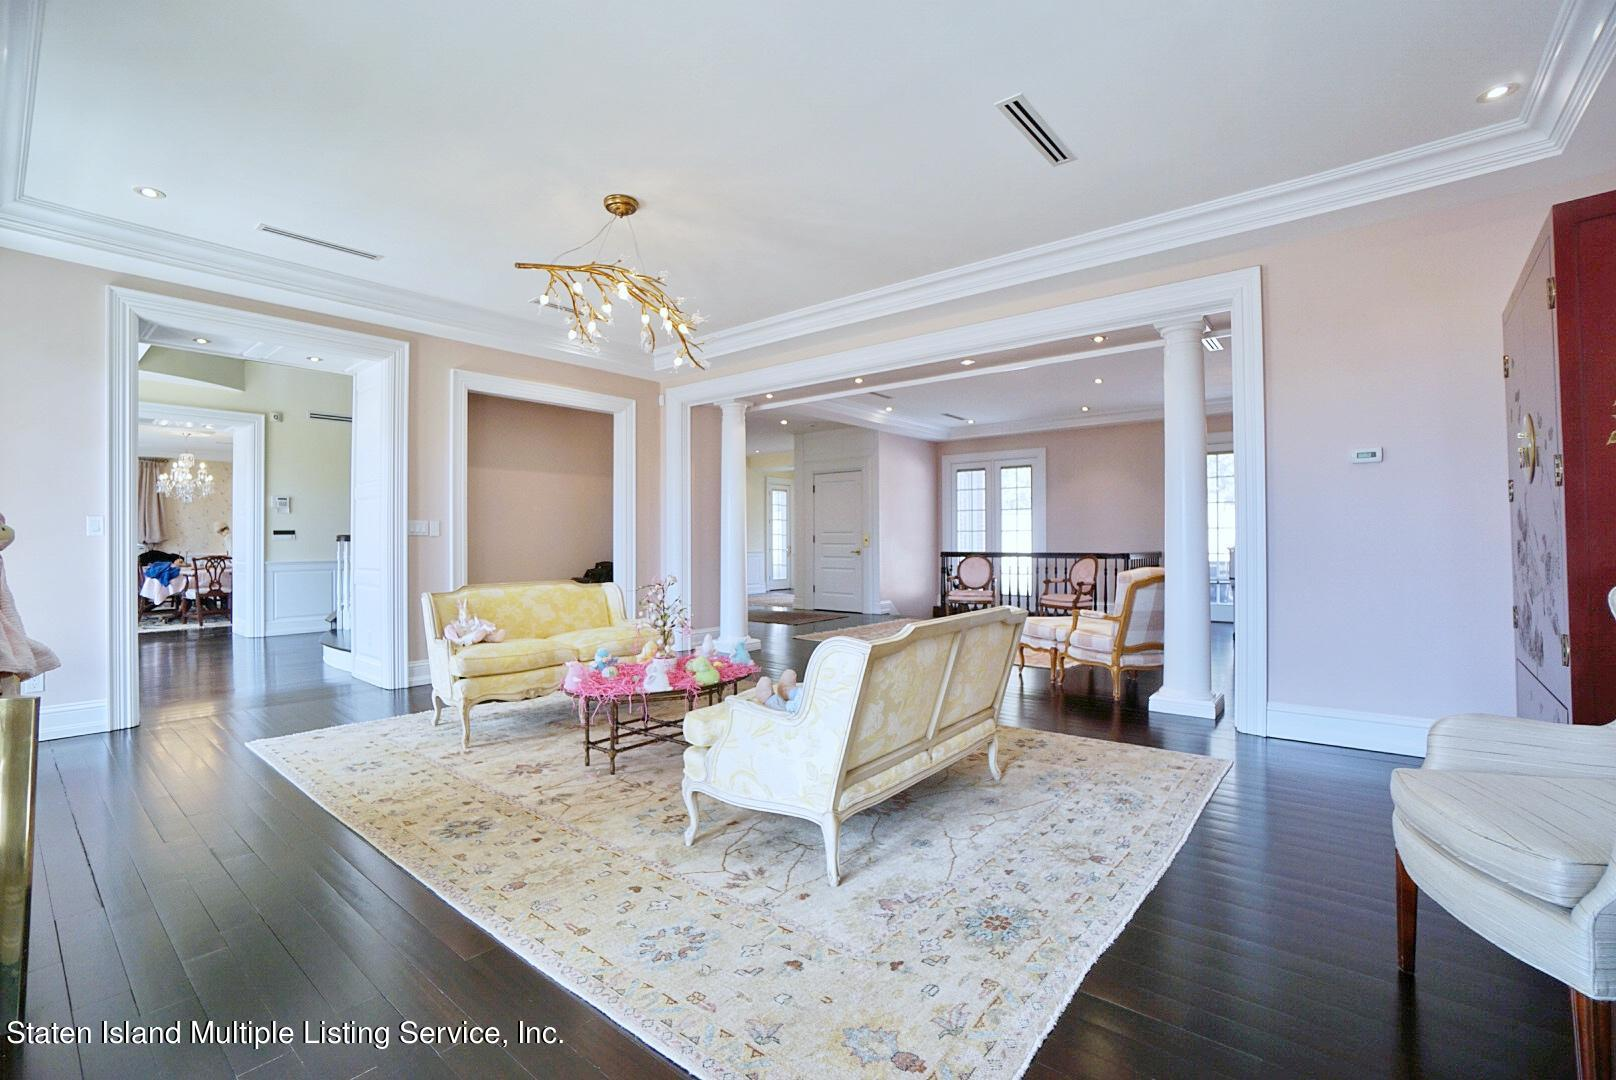 Single Family - Detached 129 Coverly Avenue   Staten Island, NY 10301, MLS-1144490-19